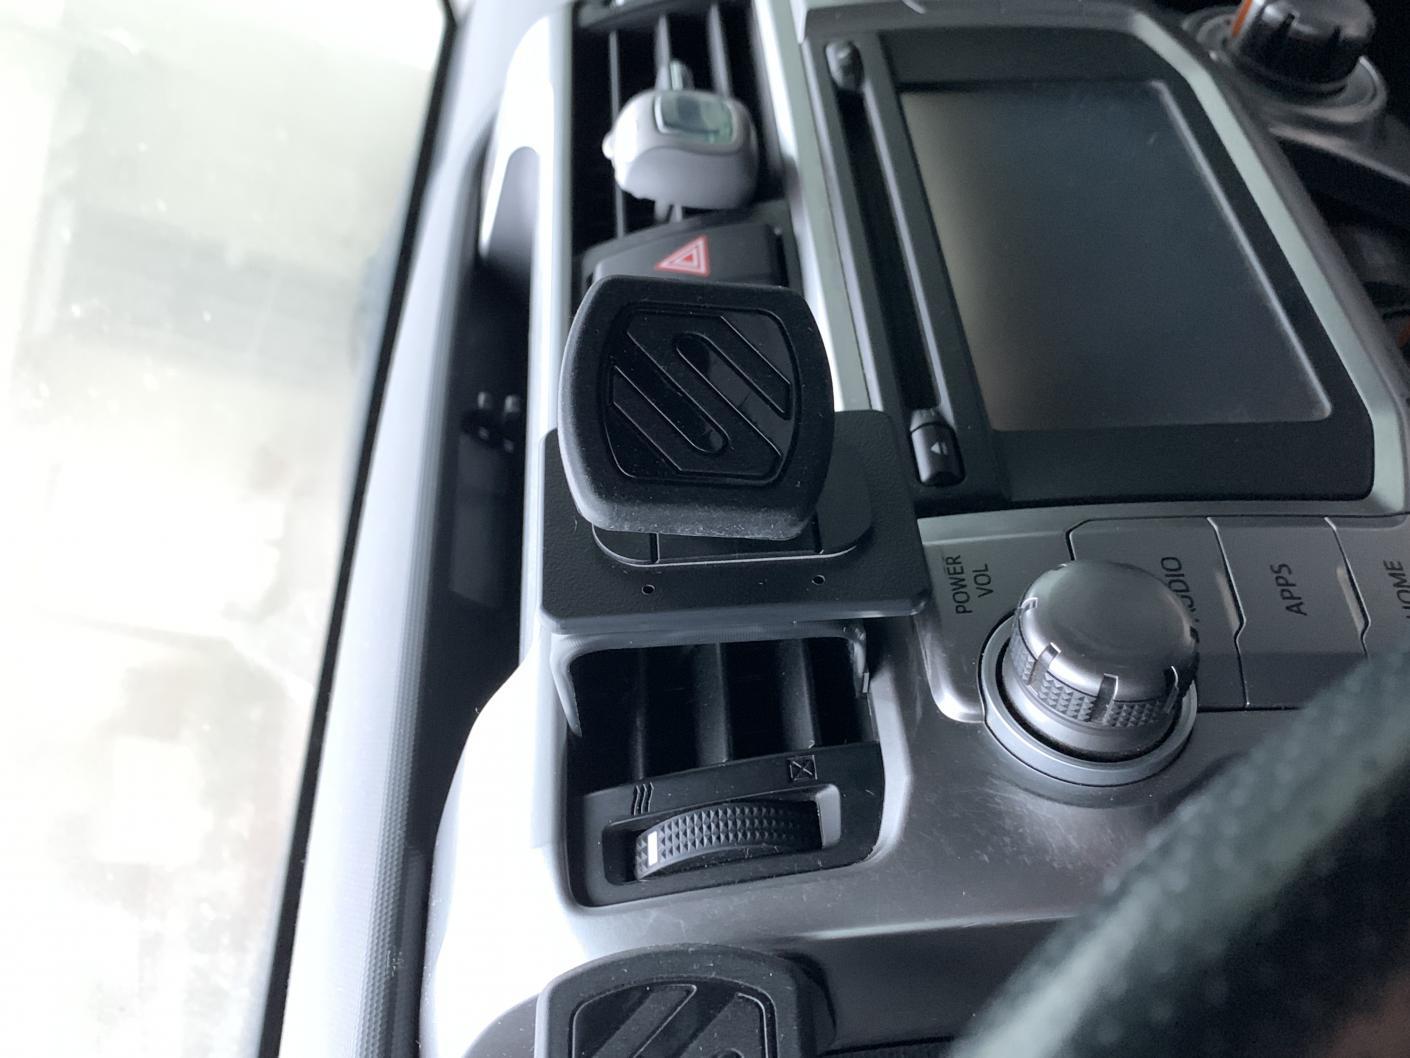 2019 Current phone mount solutions?-e3f6f81d-8135-49ac-bc99-6e89b2ede769-jpg